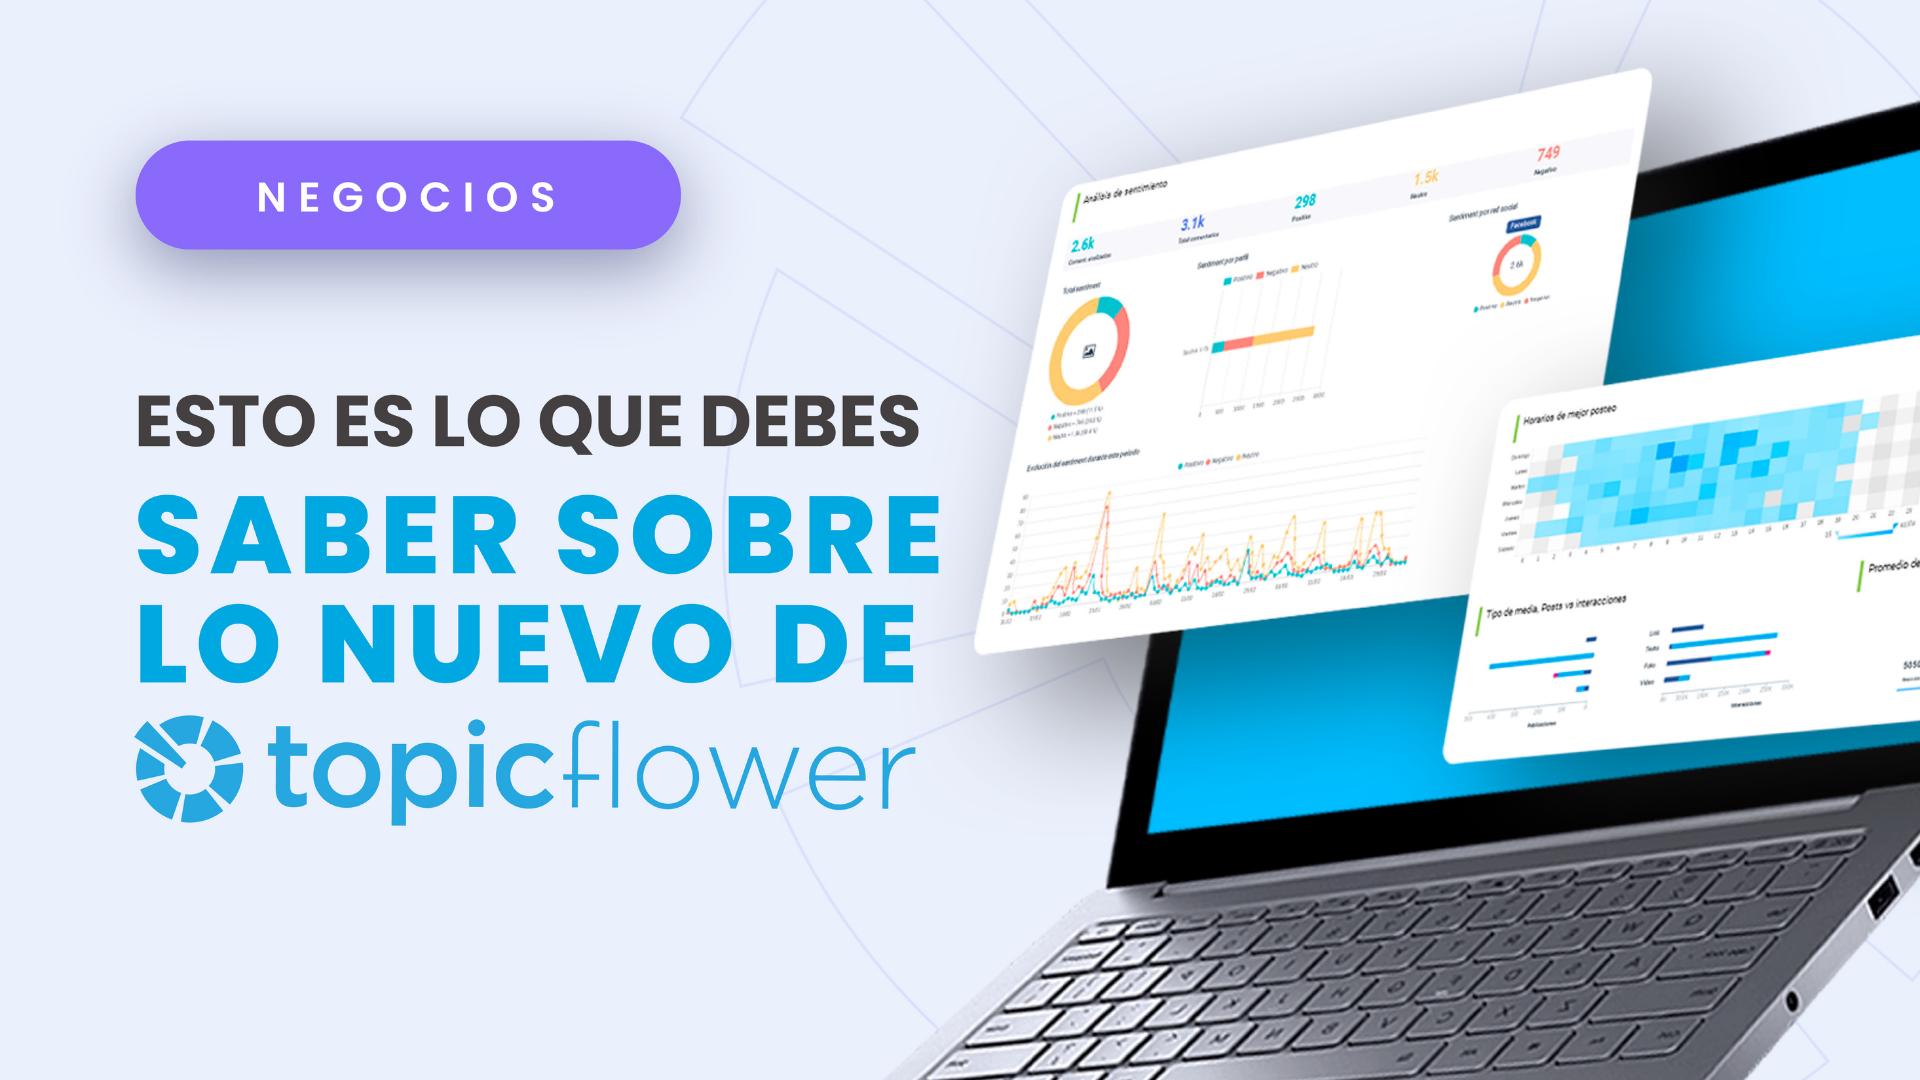 lo-nuevo-blog-topicflower